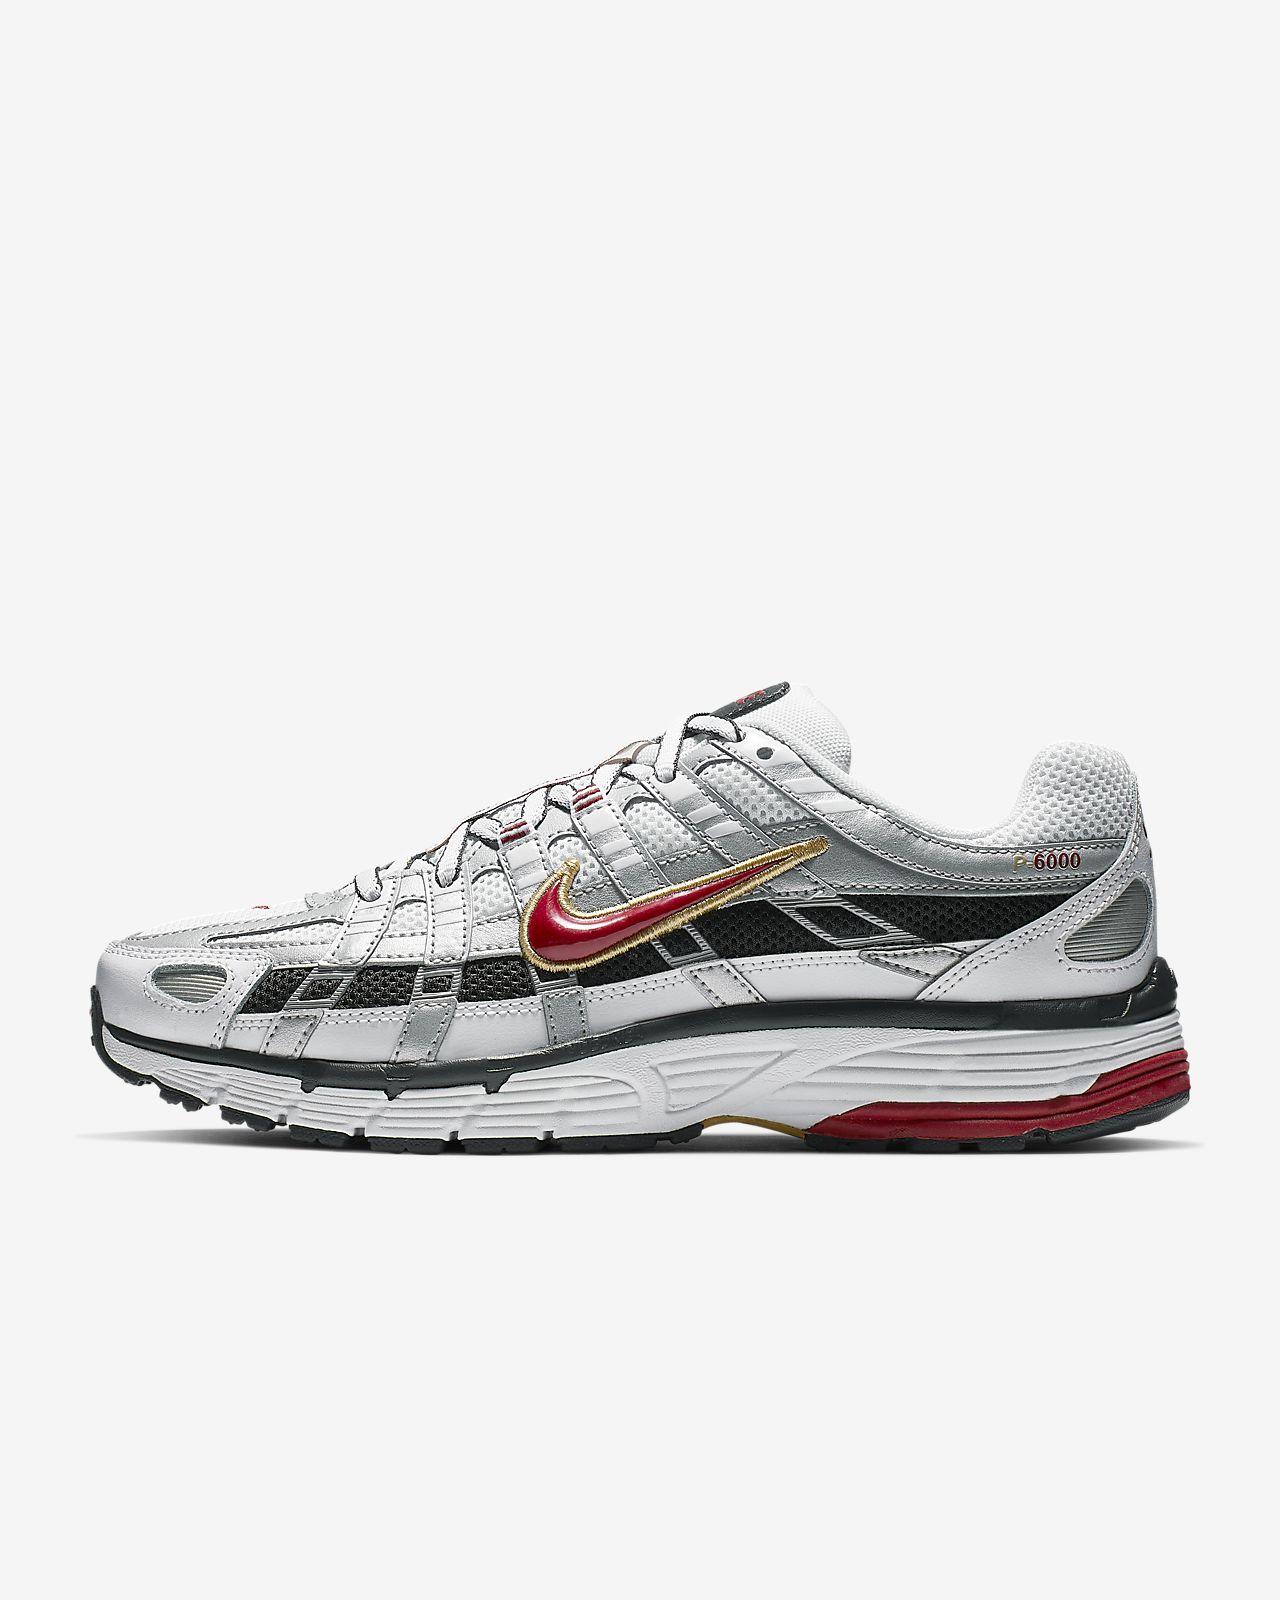 Nike Kyrie 4 Férfi Kosárlabda cipő Fekete Silver Metallic